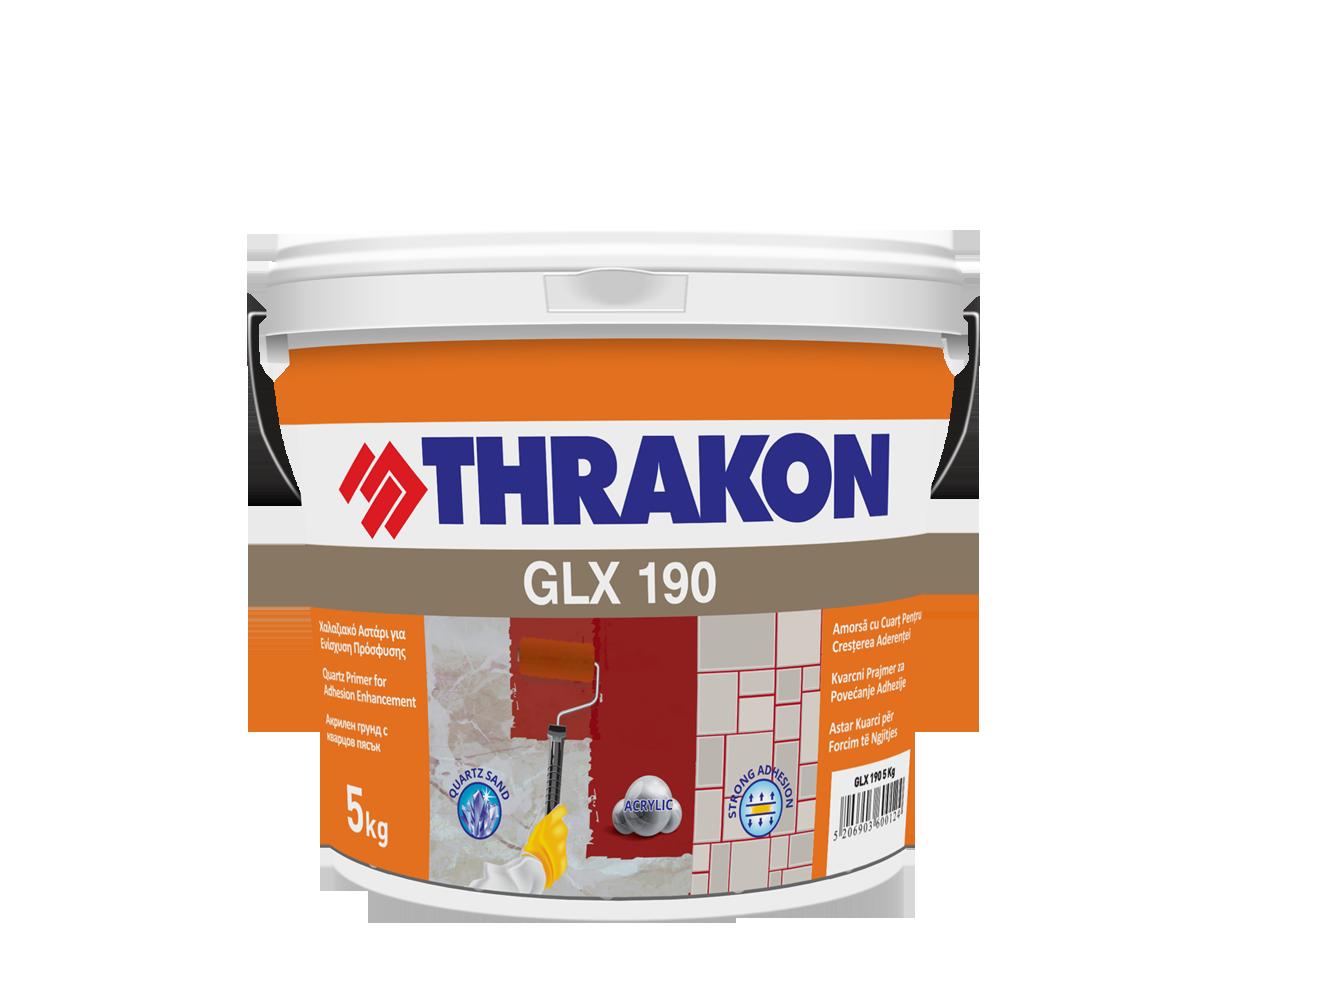 Thrakon GLX 190